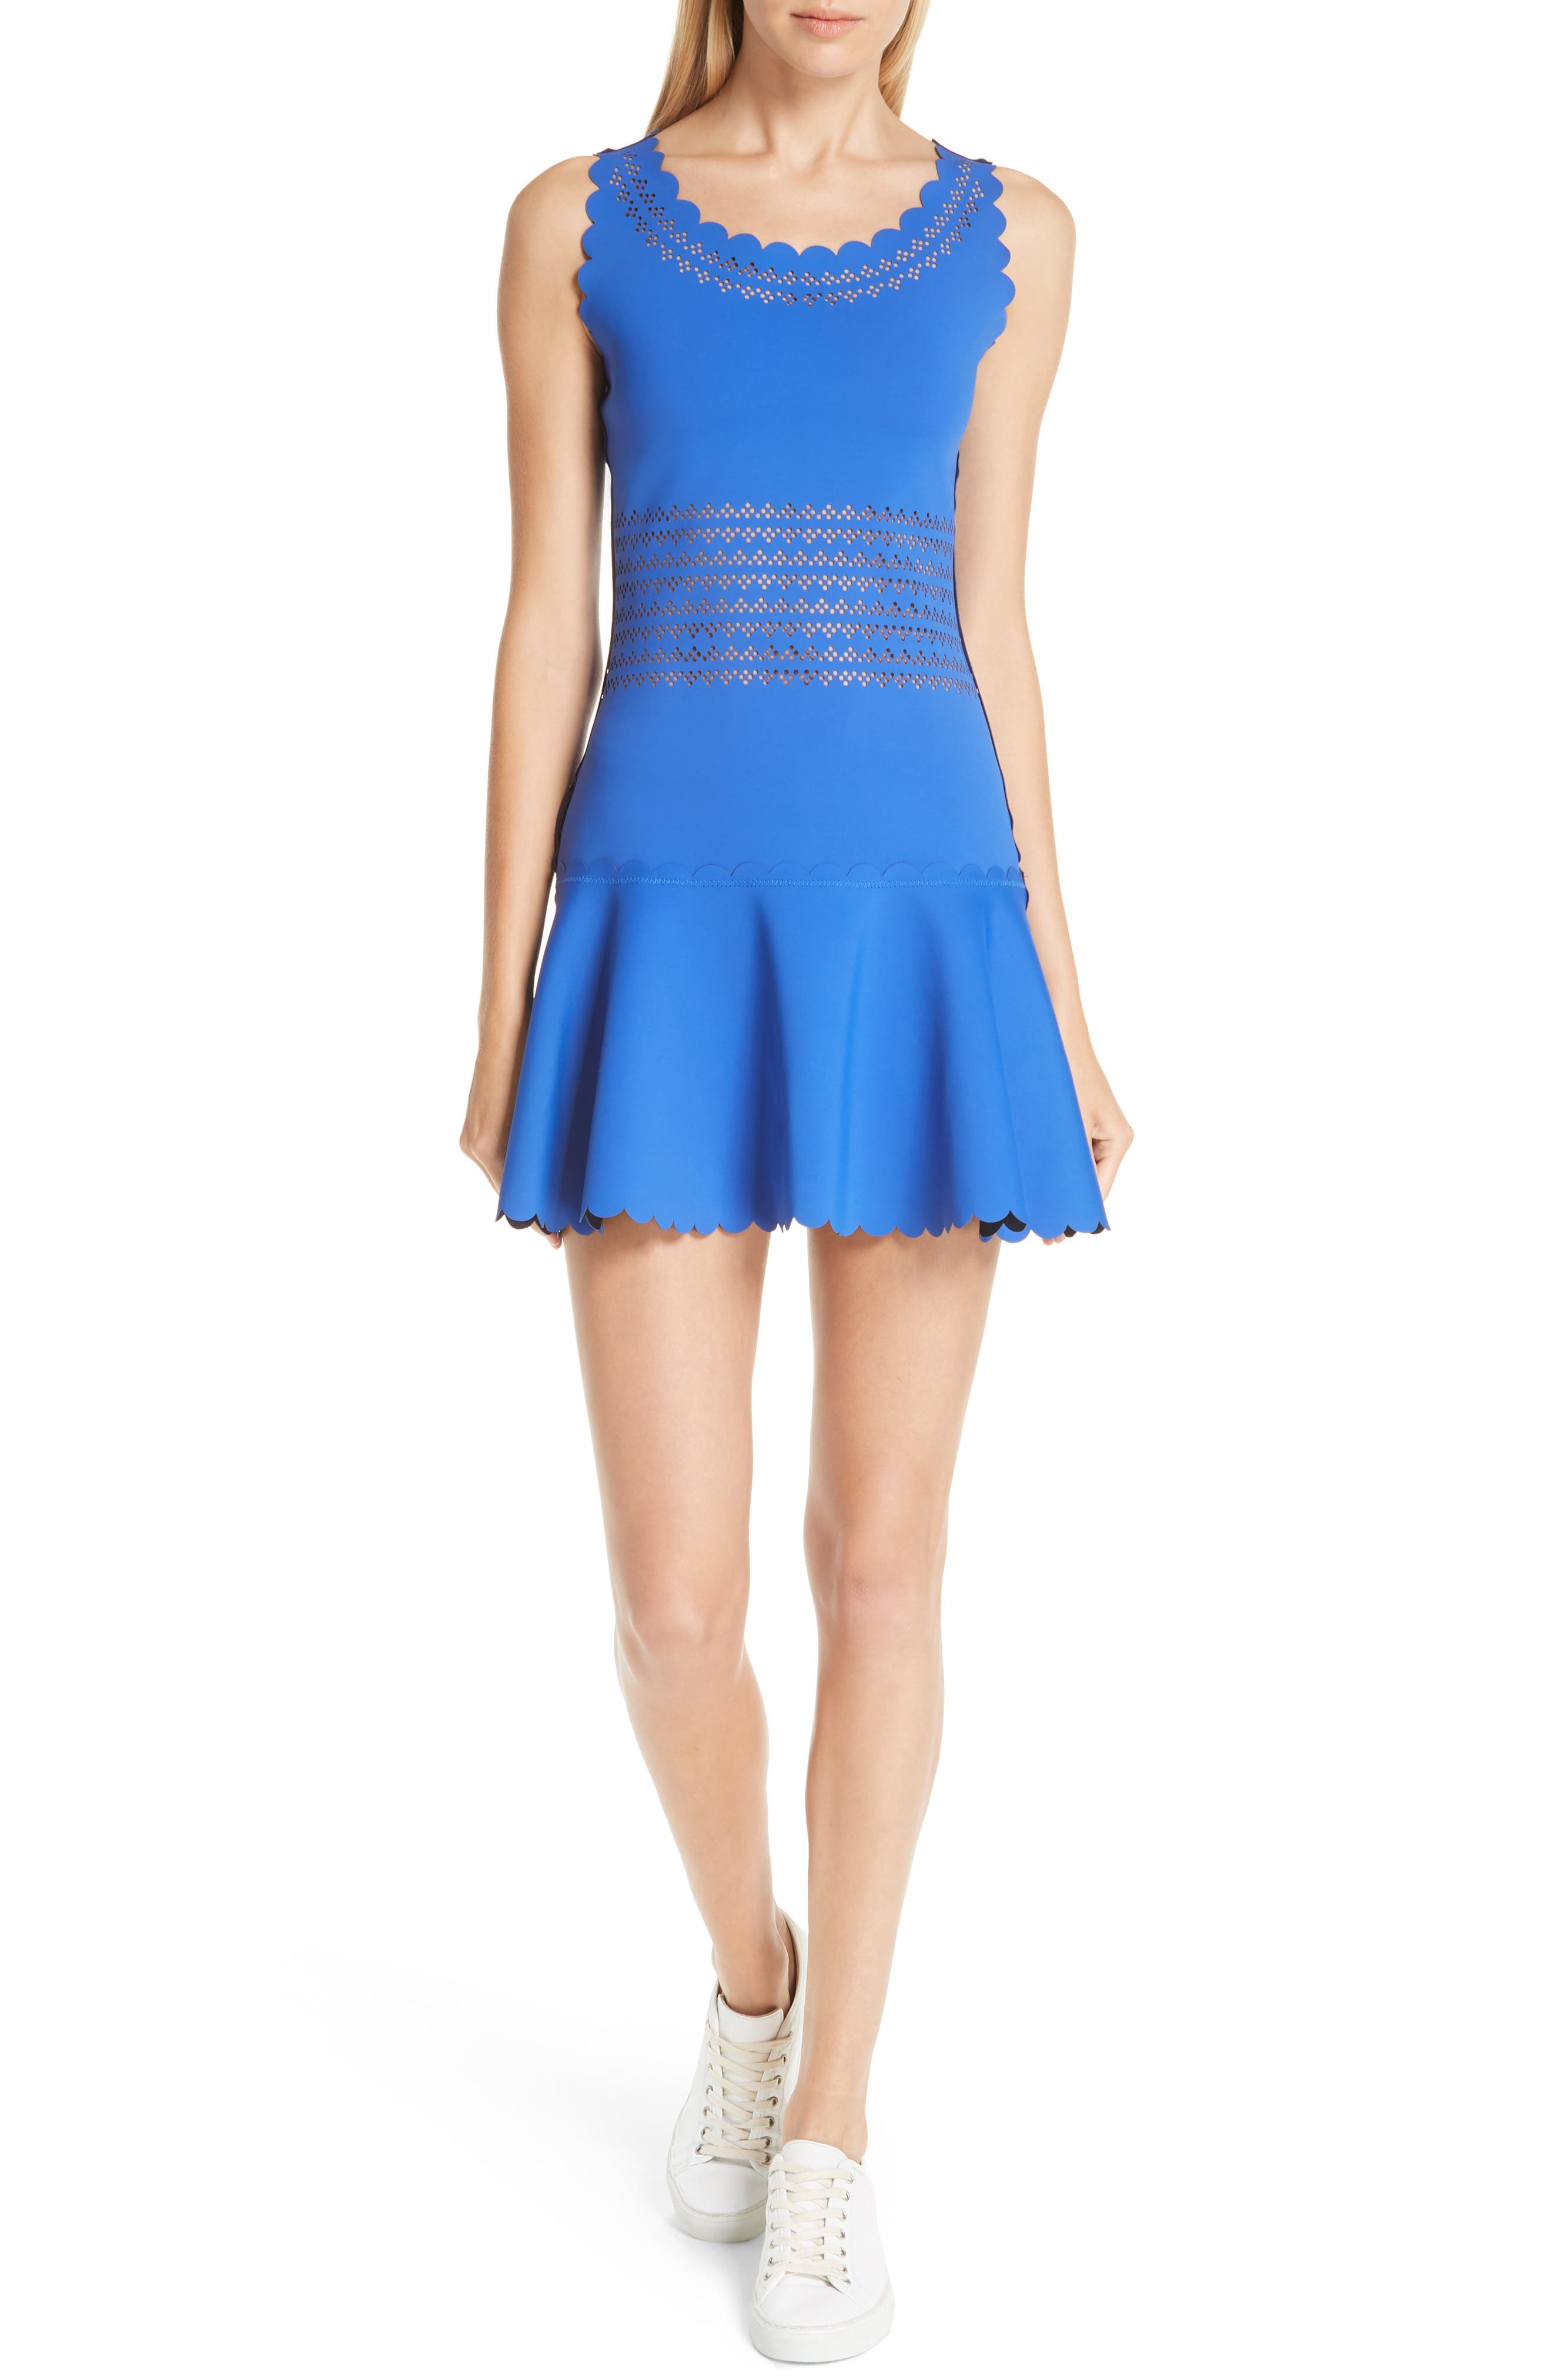 Center Court Tennis Dress,                         Main,                         color, BLUE